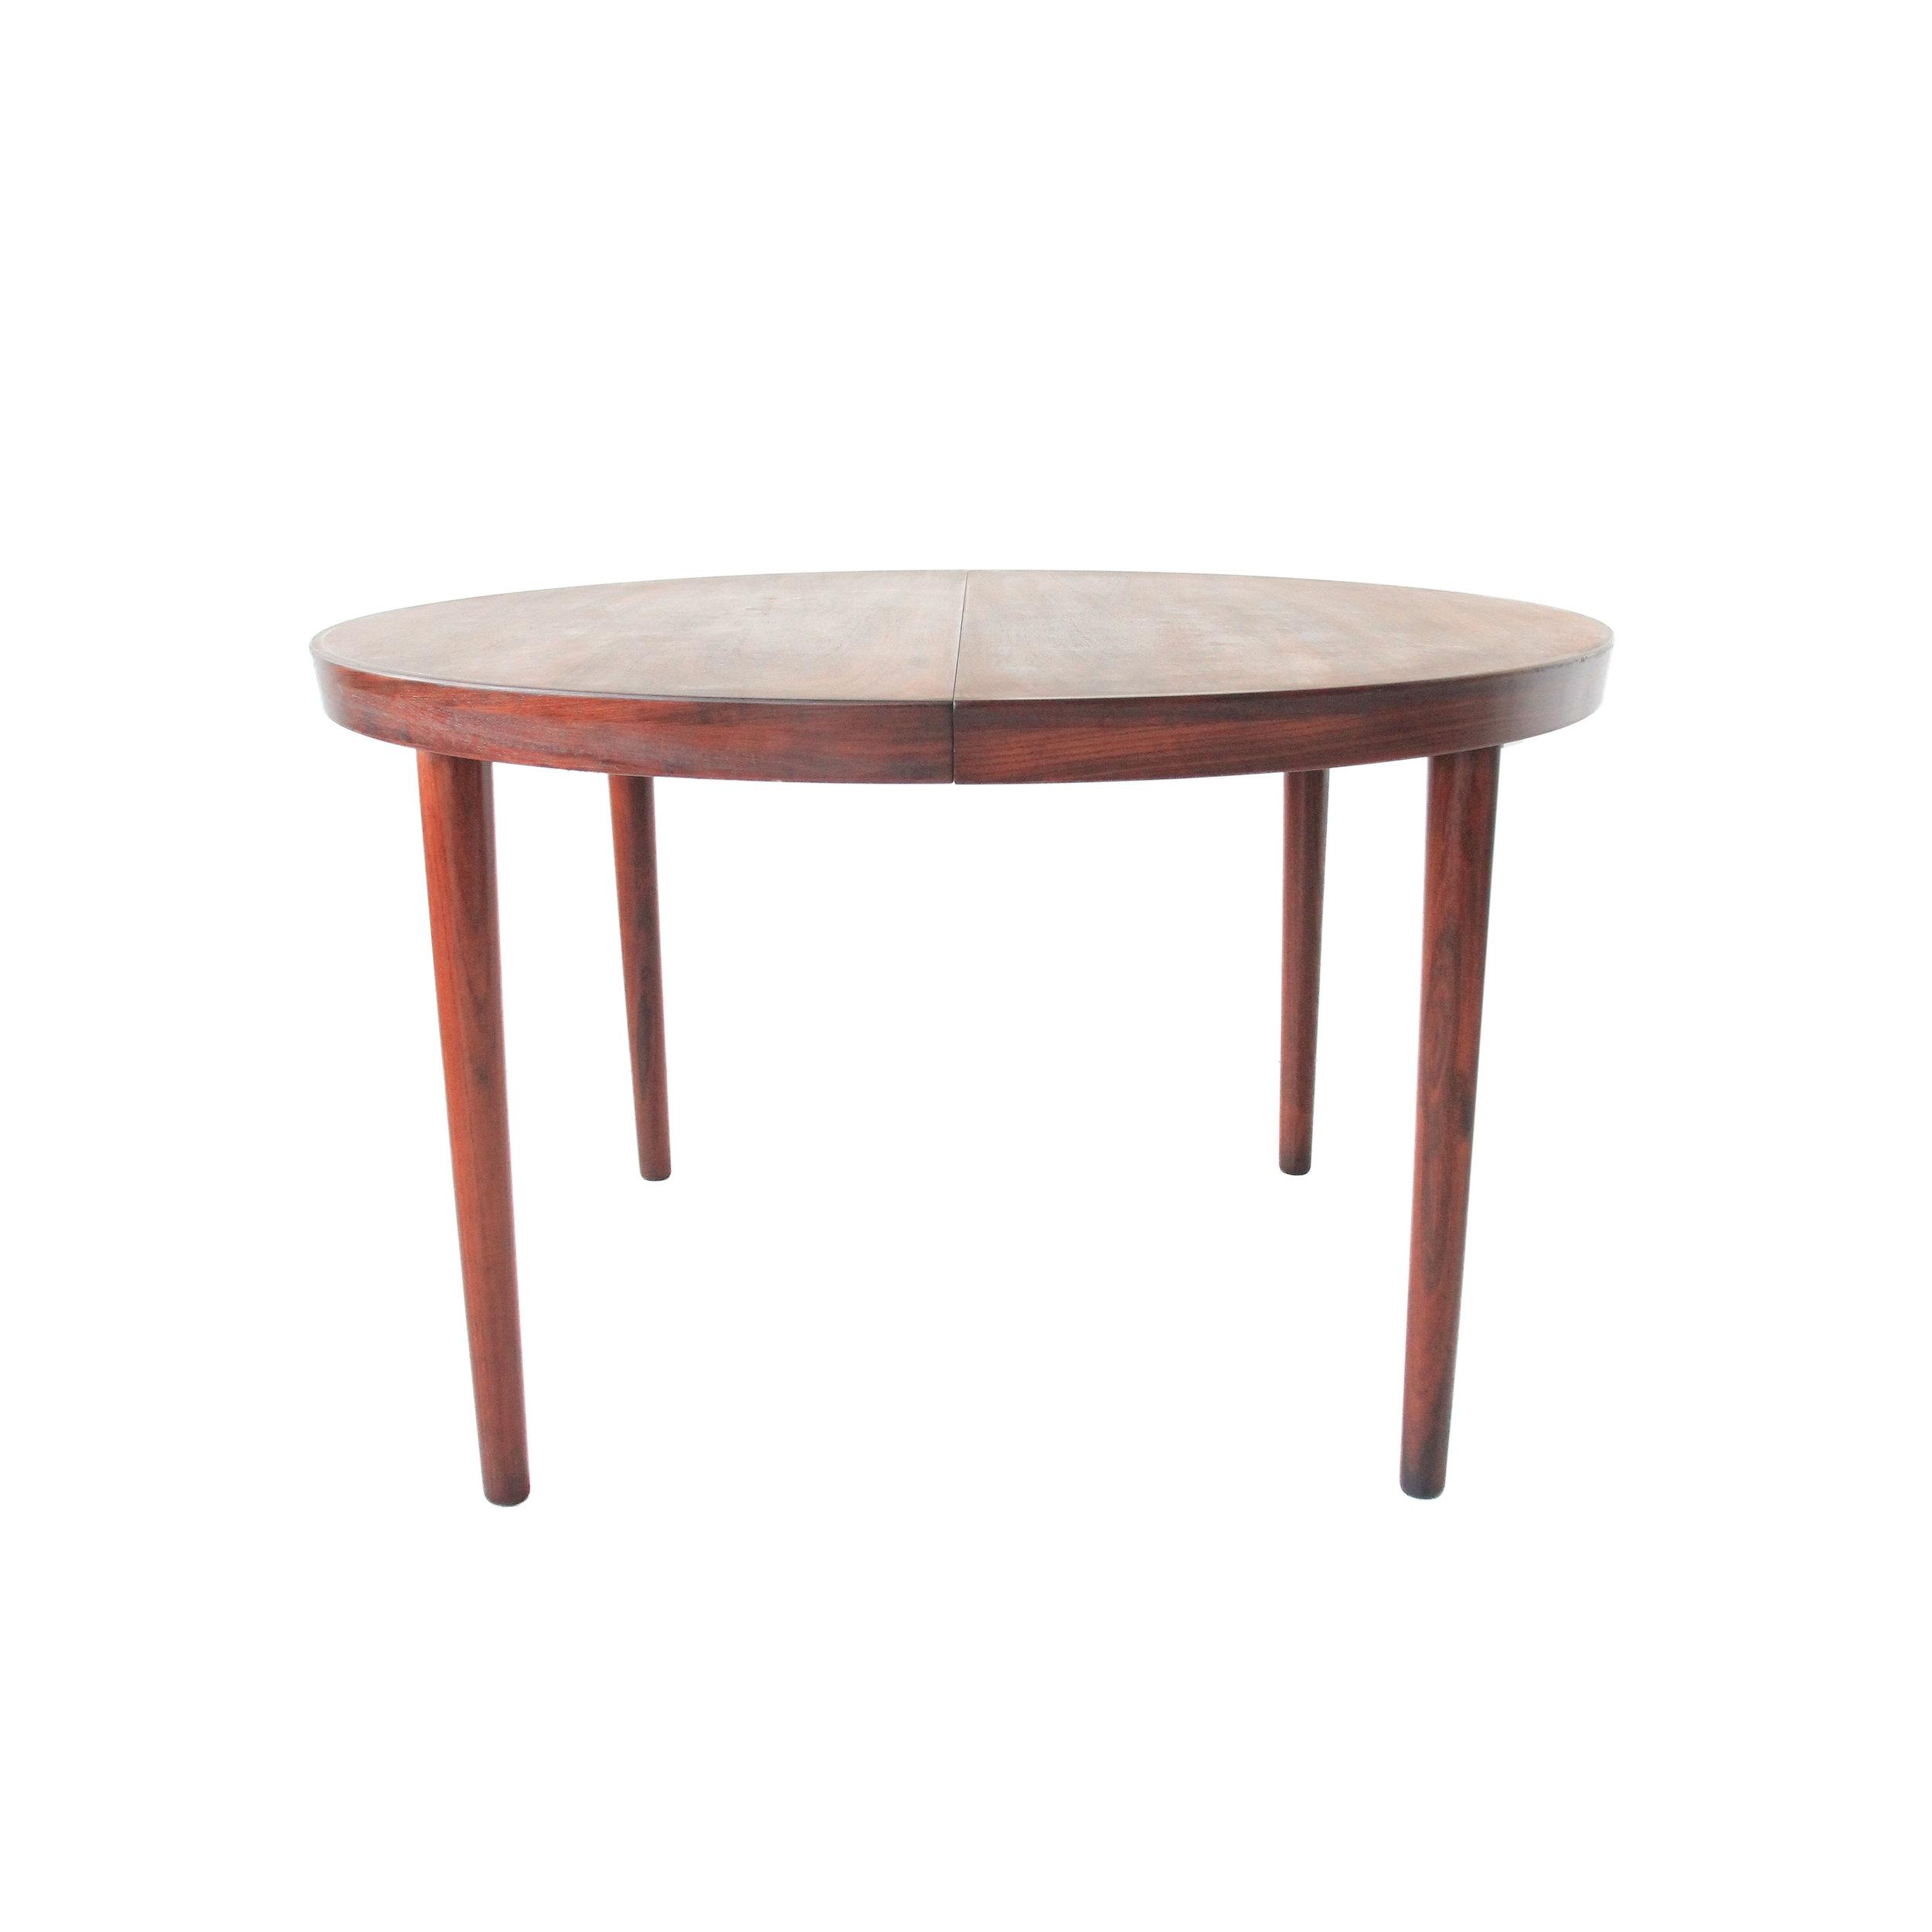 round danish vintage mid century modern redwood dining table.jpg